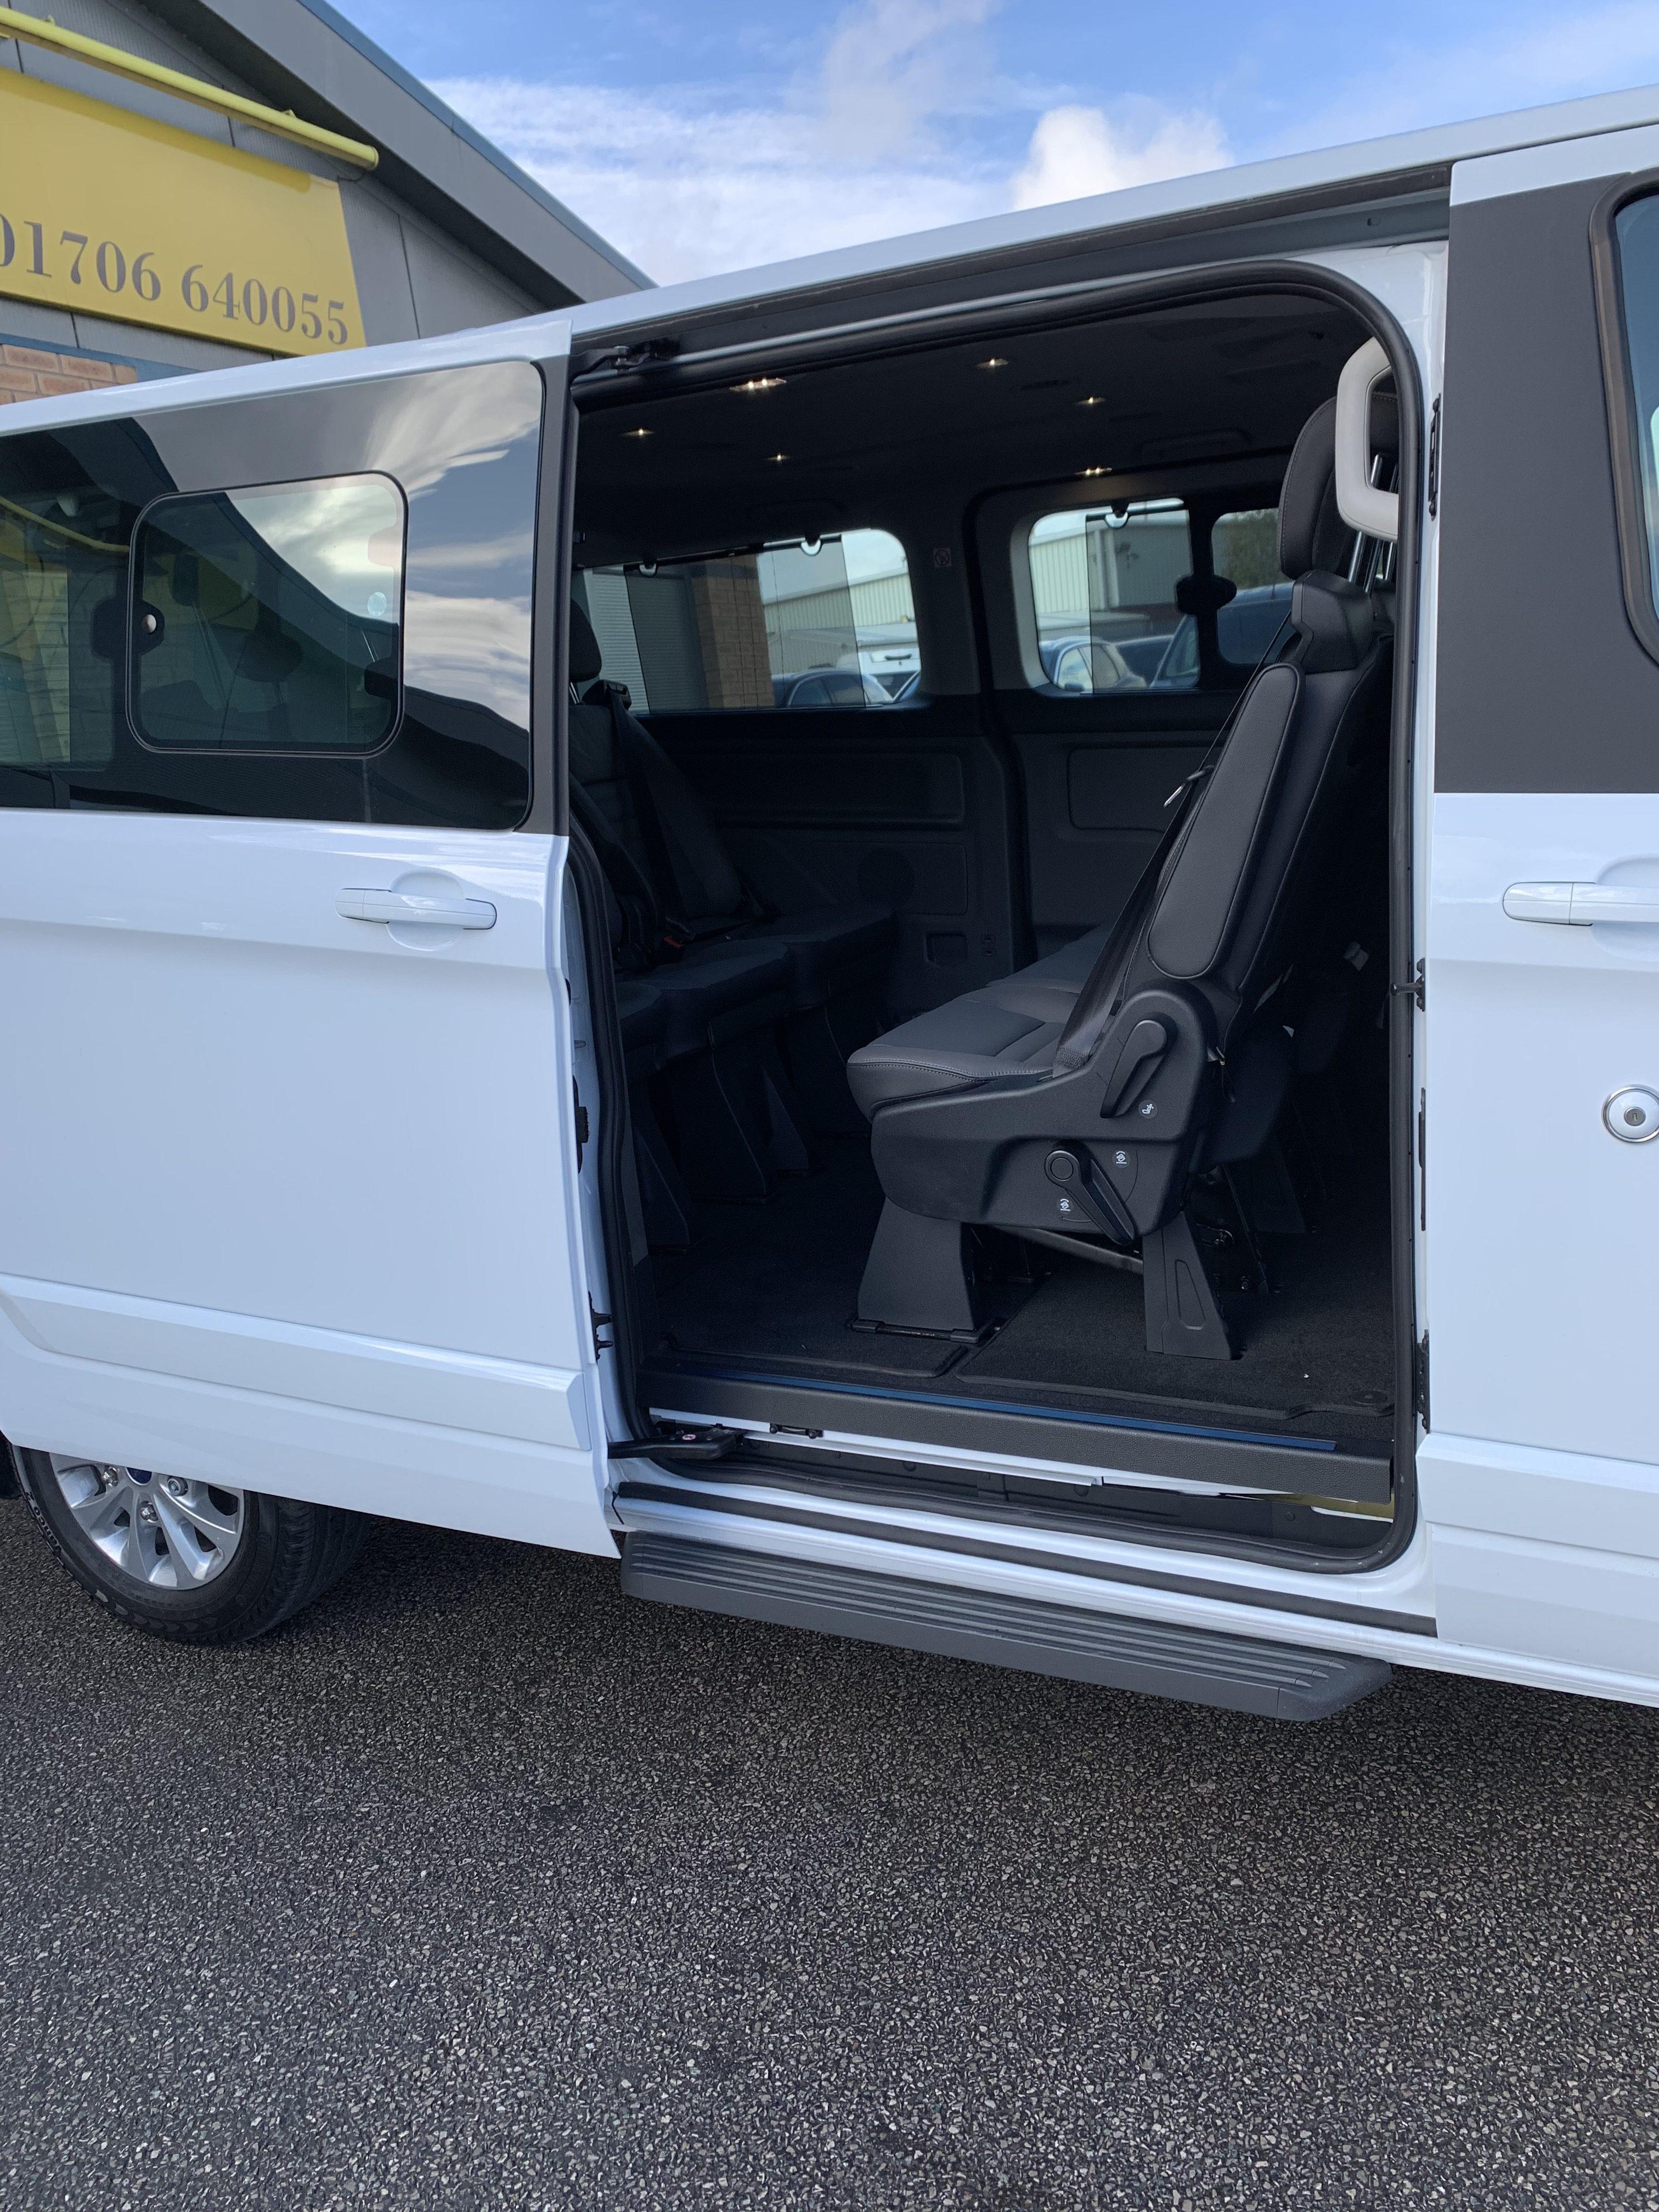 Ford Transit Tourneo Custom (9-Seater)